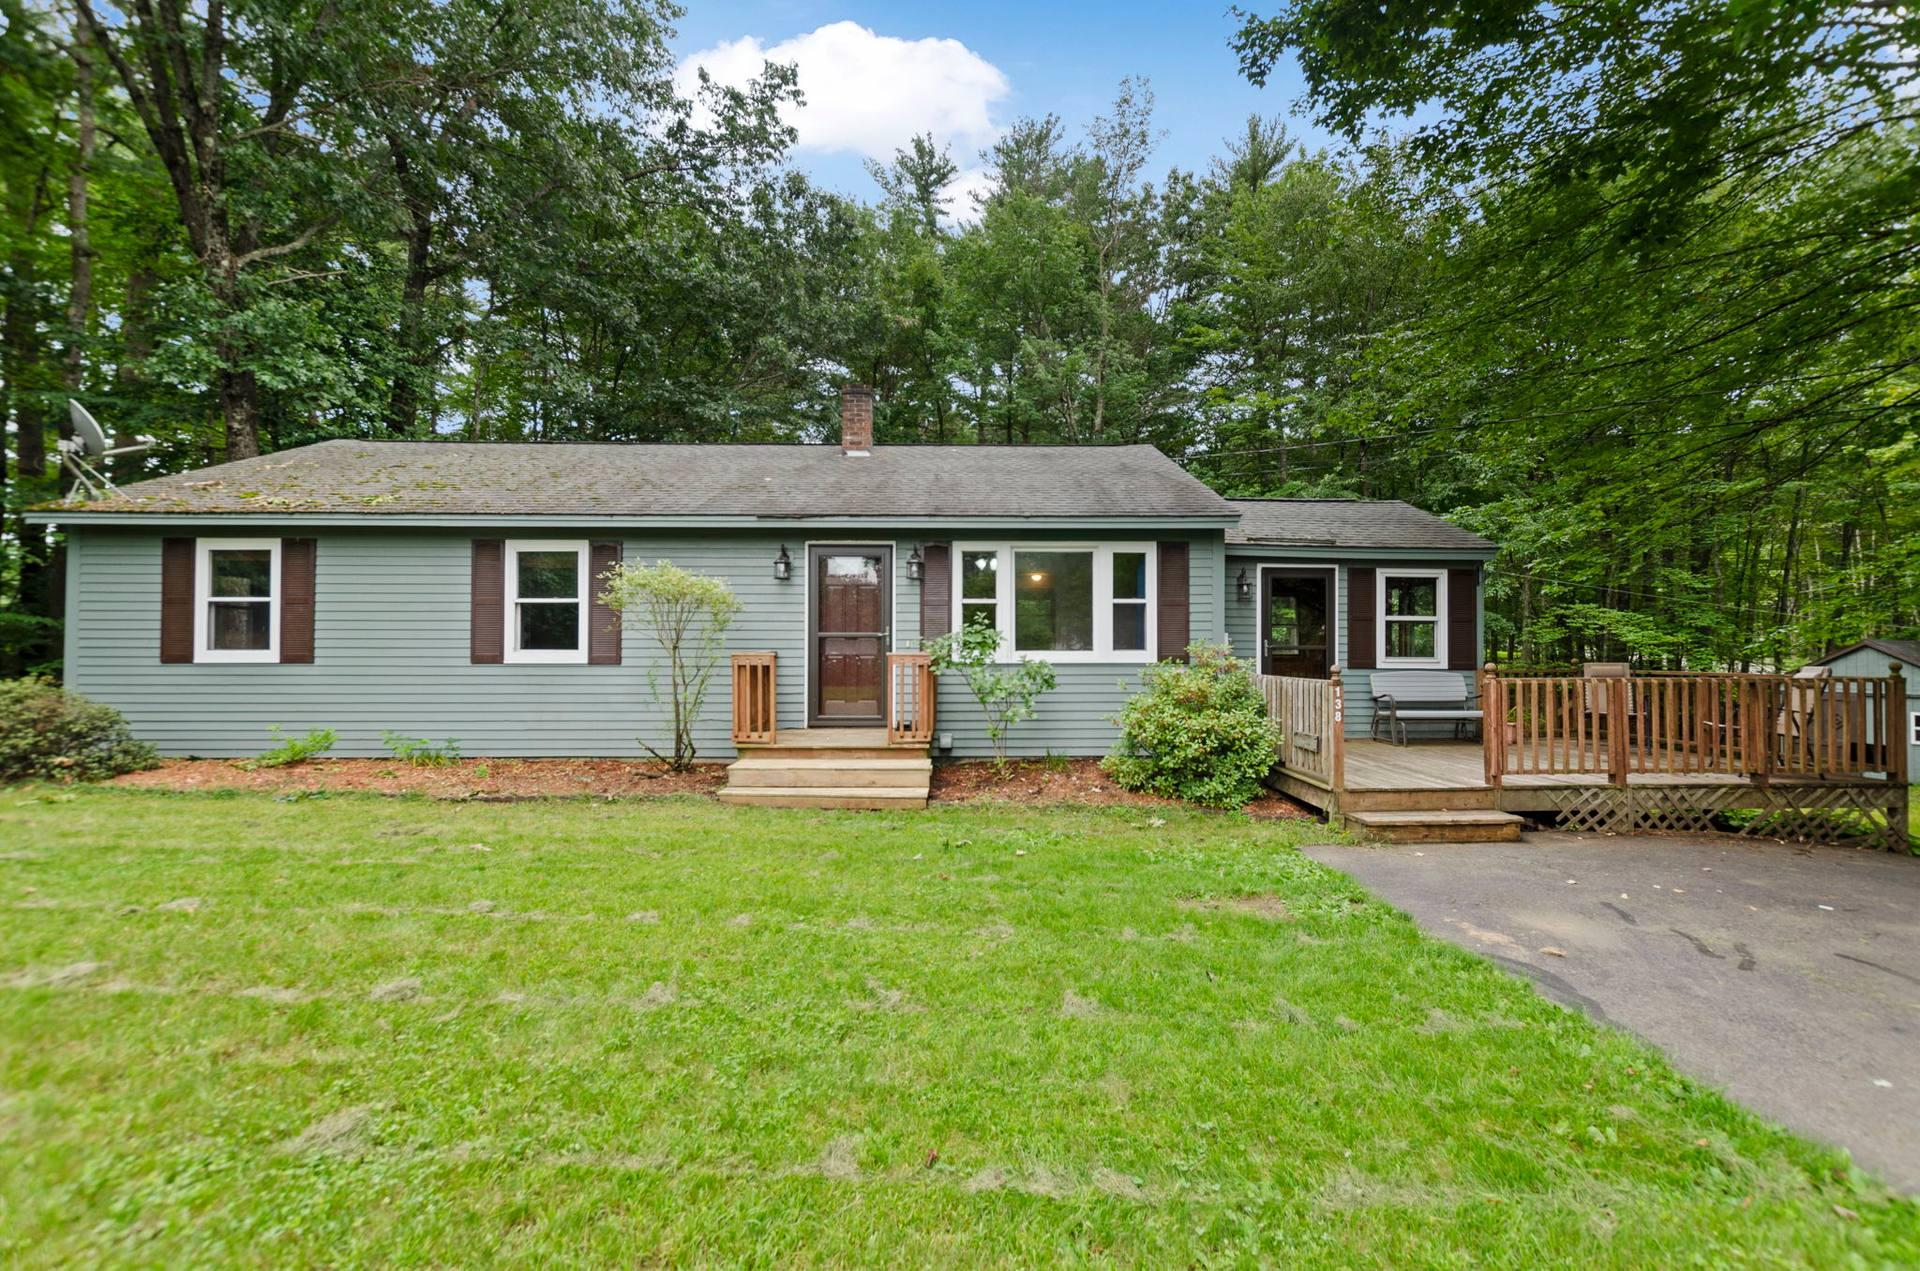 138 Sewalls Falls Rd, Concord, NH 03301, USA